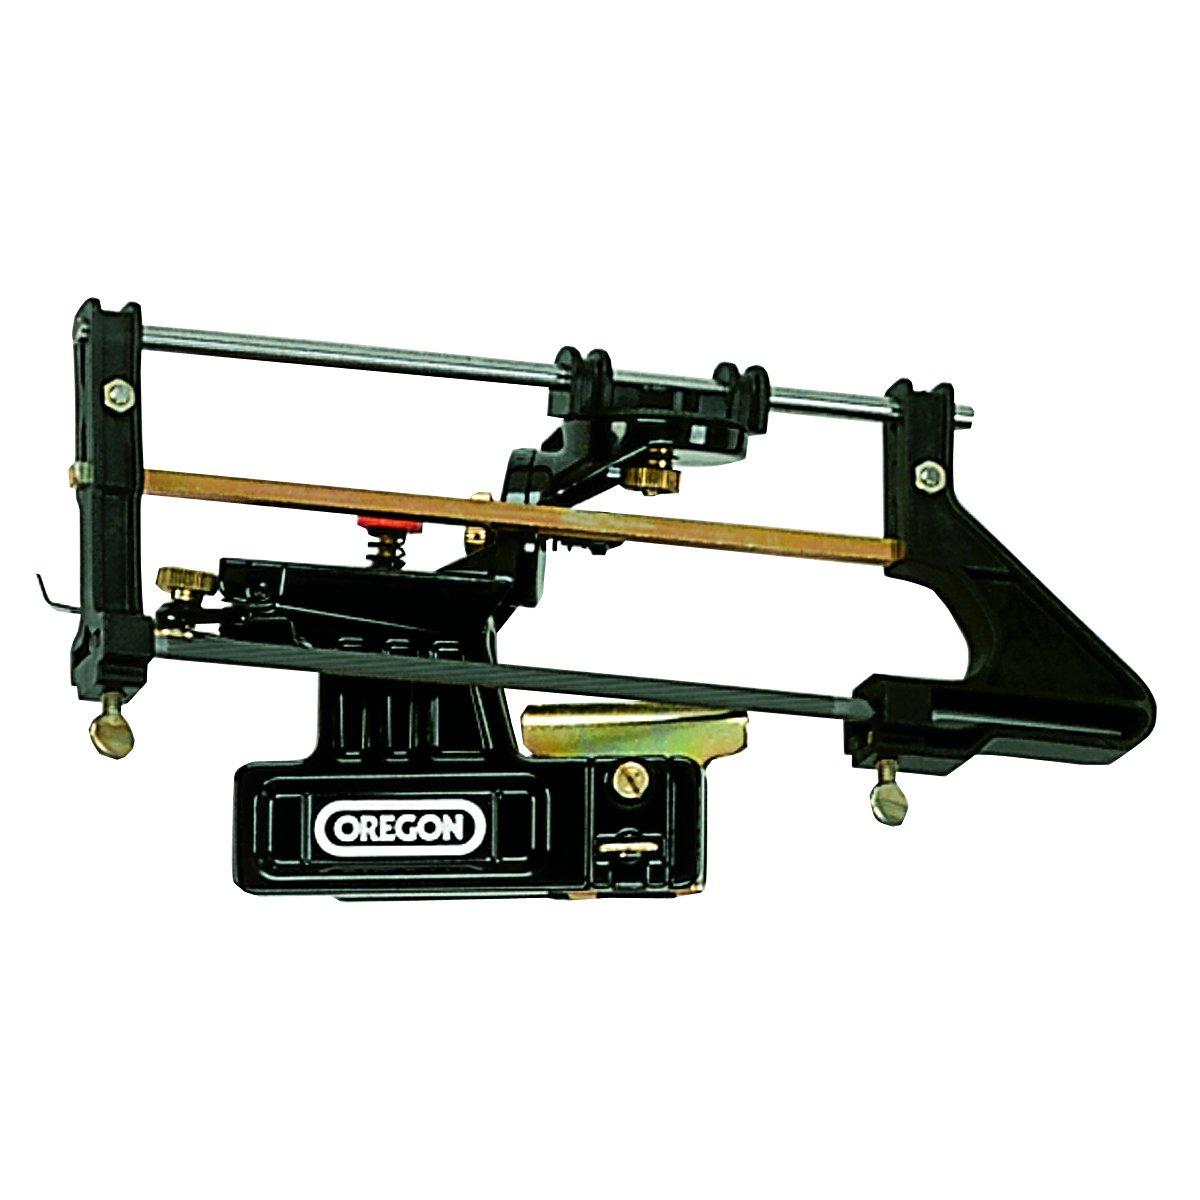 Oregon 23736A Professional Chain Saw Bar-Mount Filing Guide 557849